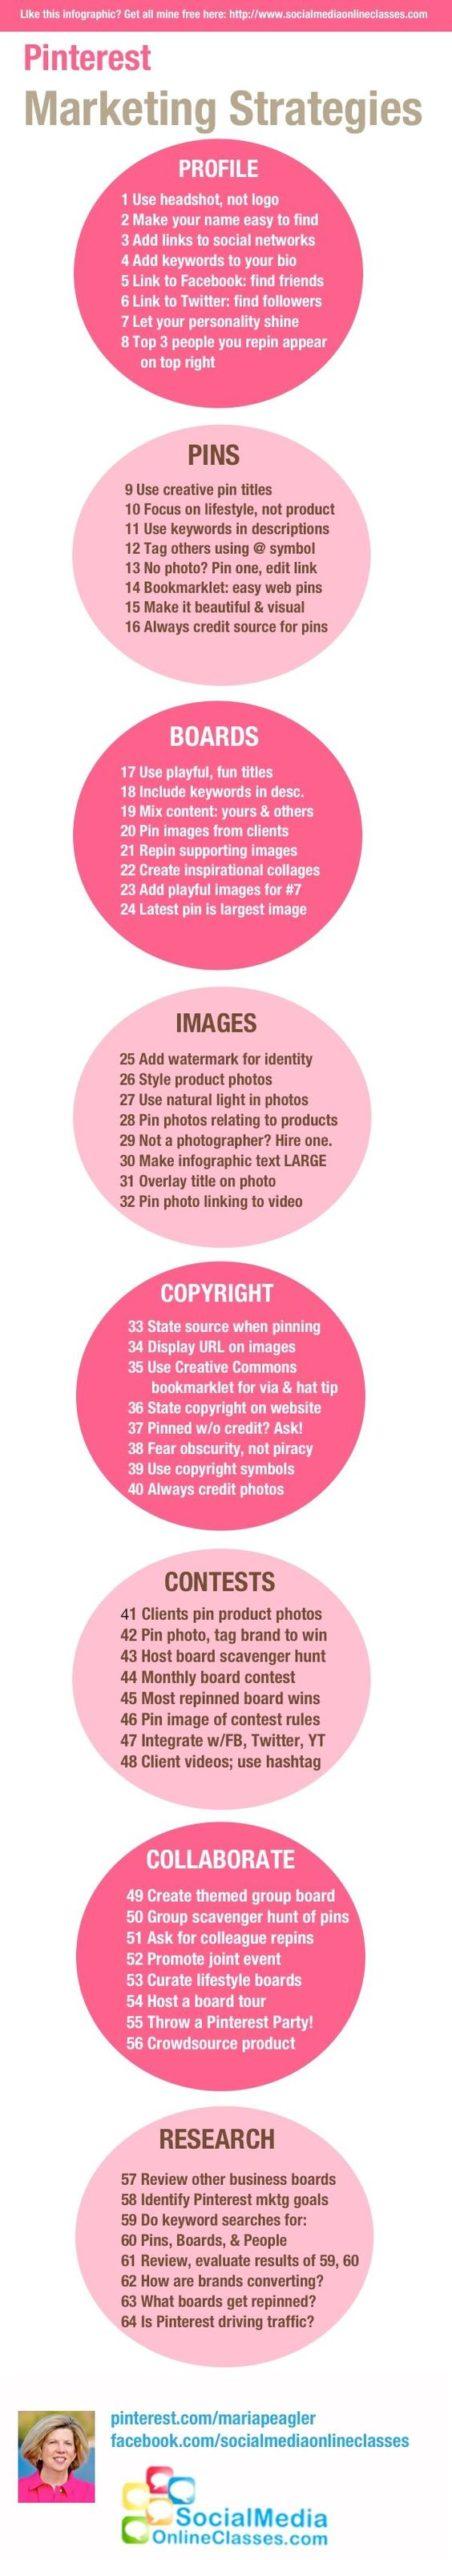 Il marketing su Pinterest